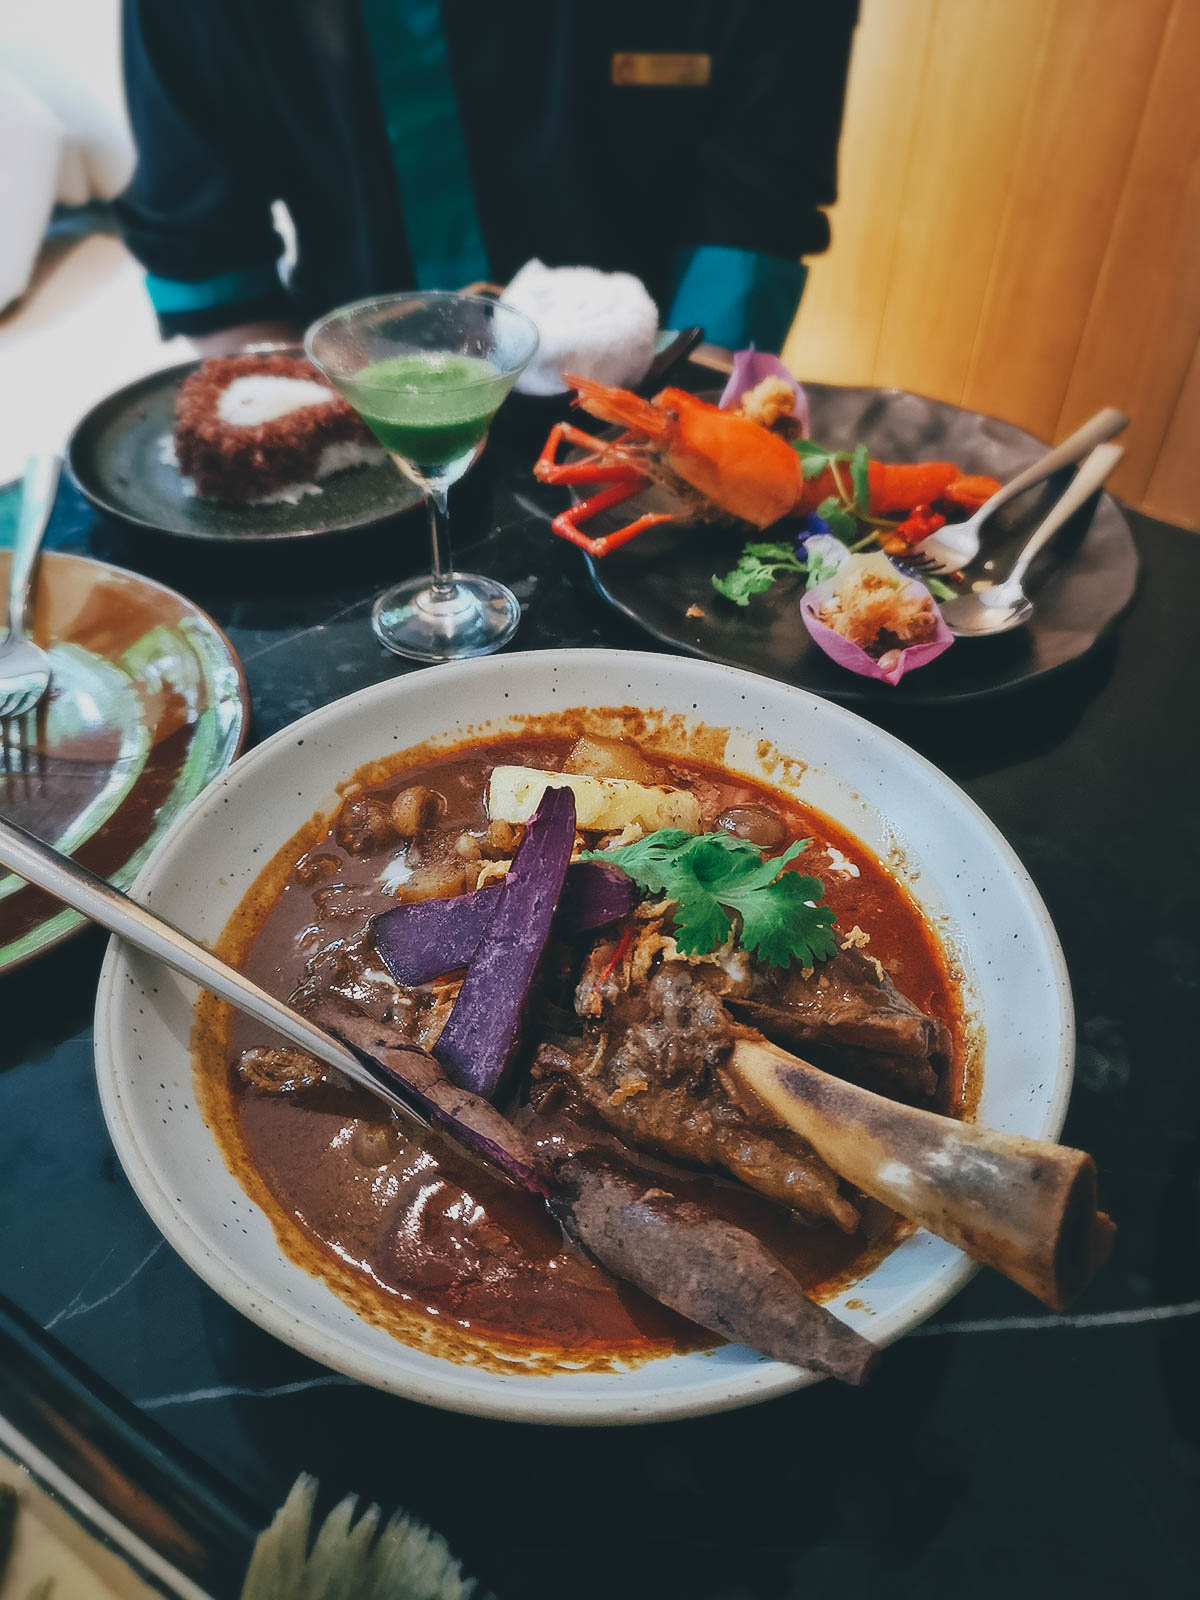 Suan Bua Thai Restaurant, Centara Grand at Central Plaza Ladprao, Bangkok, Thailand